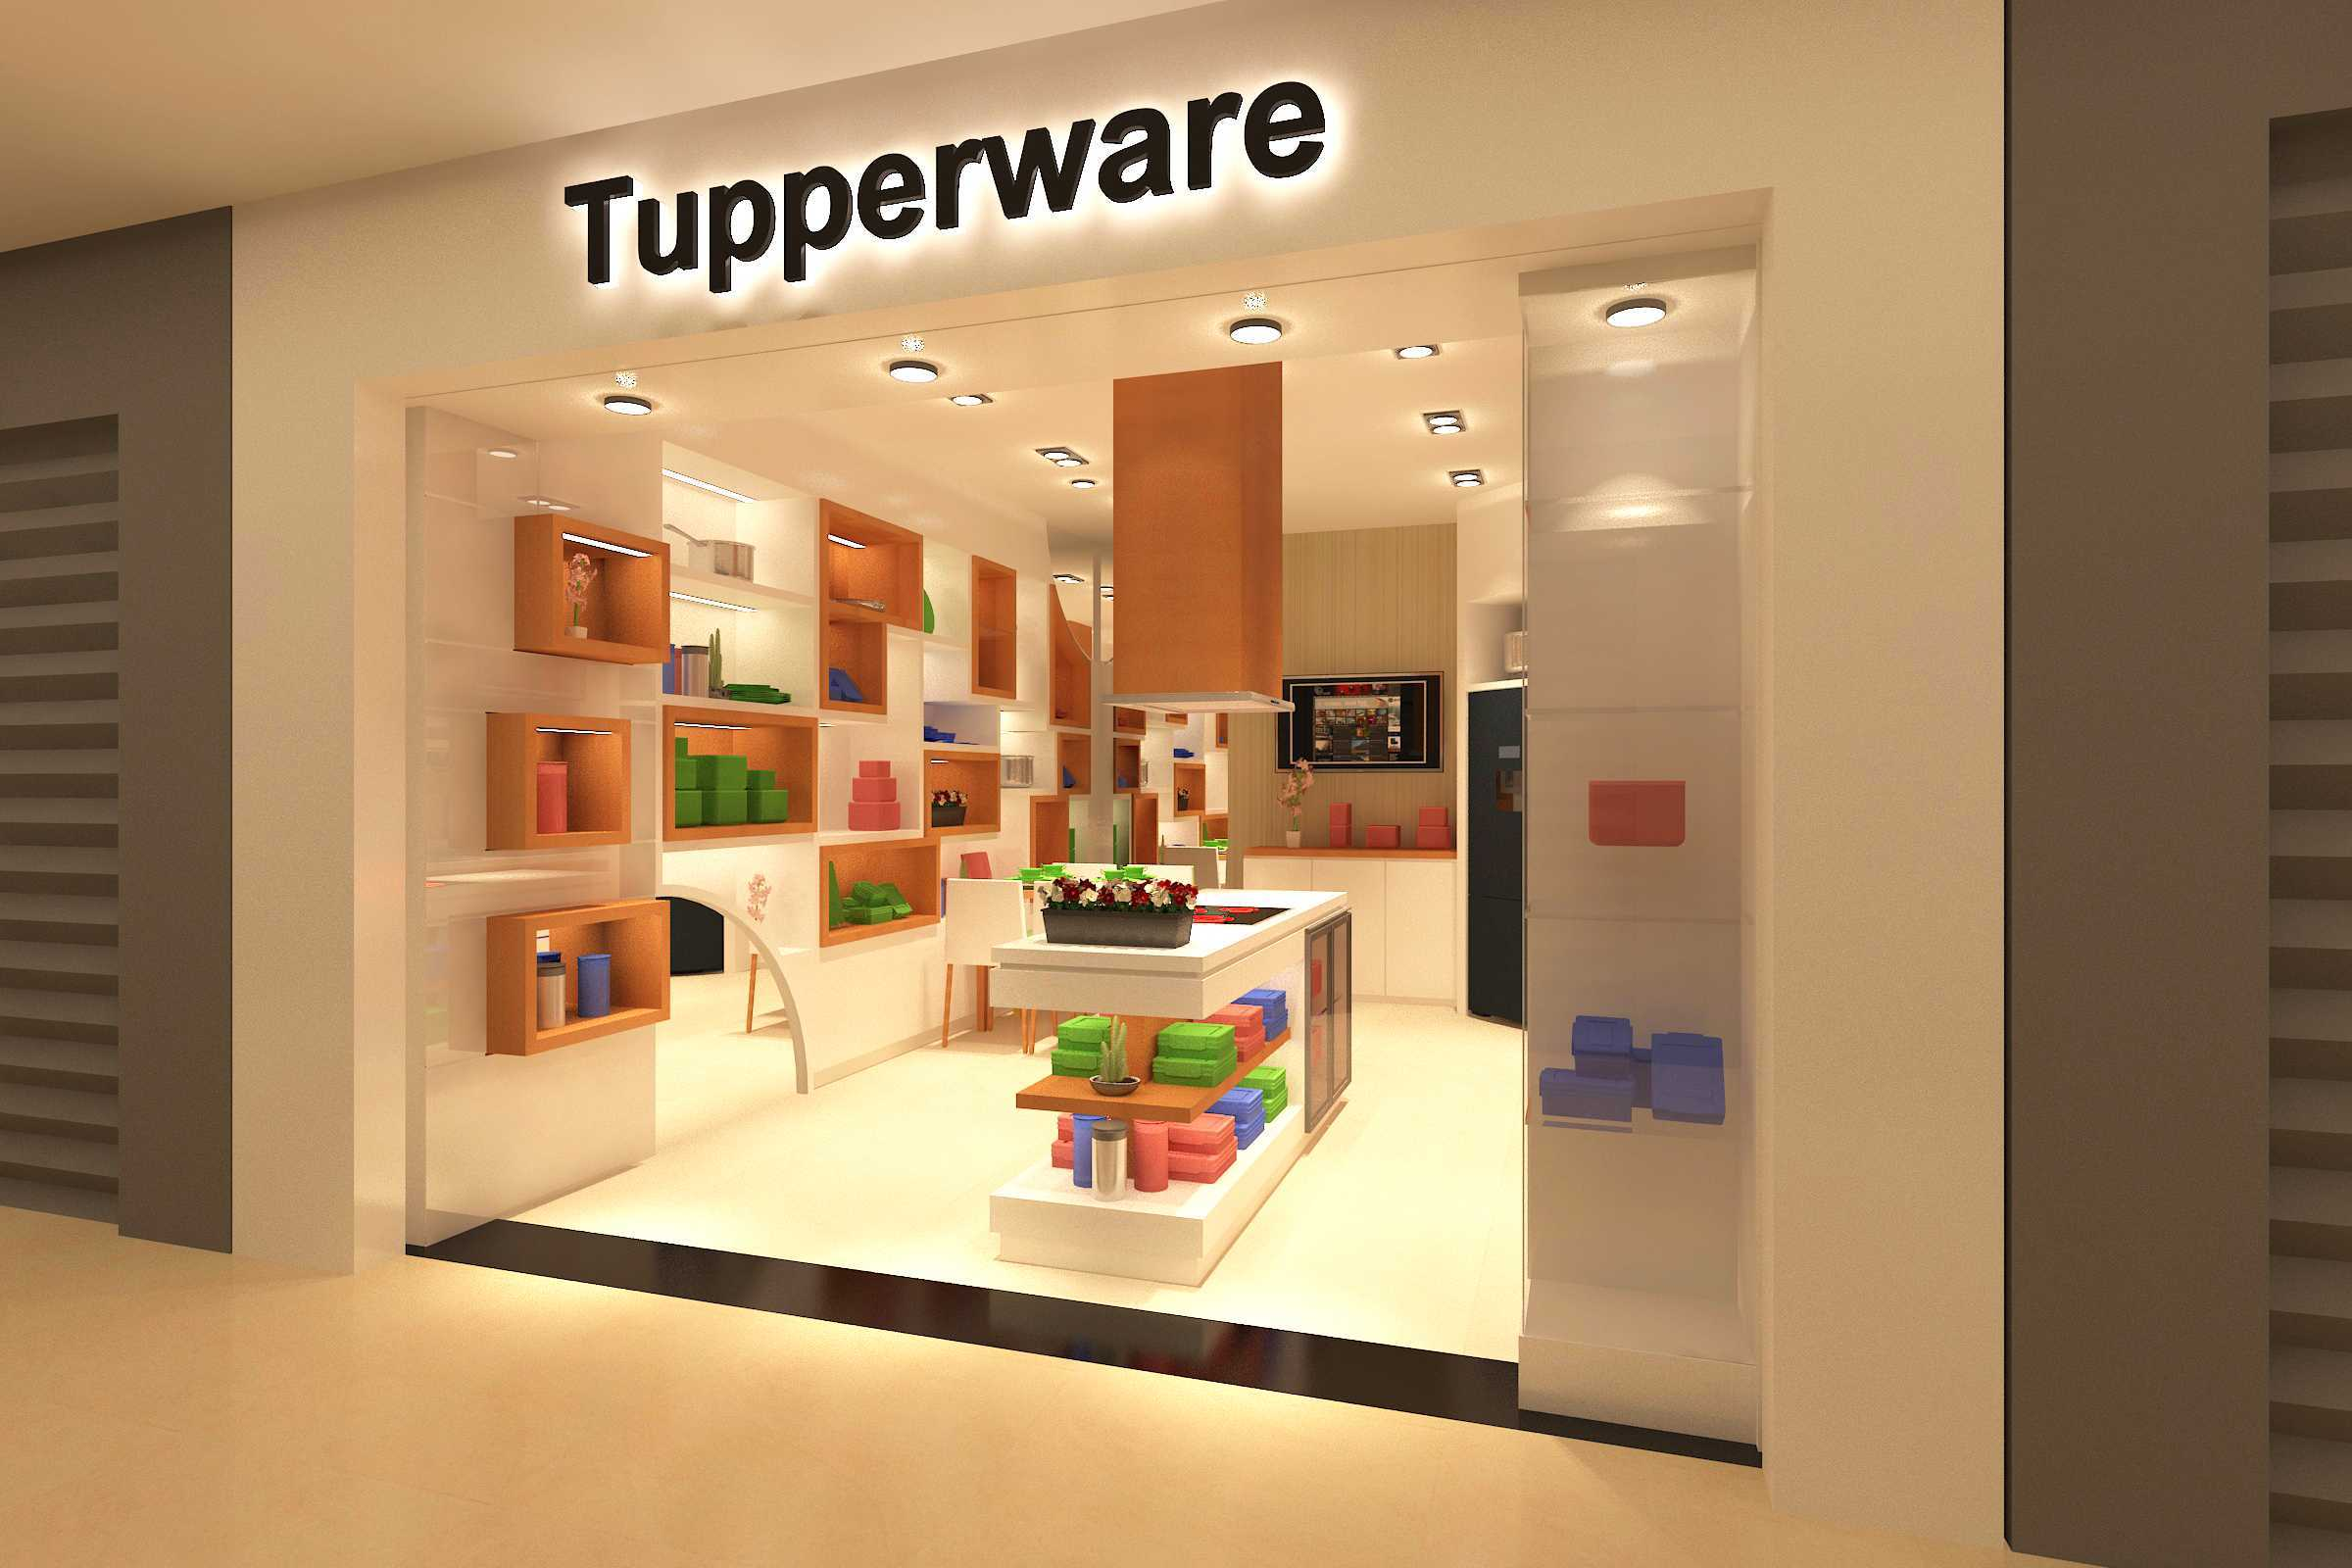 Cds Studio Tupperware Studio - Pondok Indah Mall Jakarta, Daerah Khusus Ibukota Jakarta, Indonesia Jakarta, Daerah Khusus Ibukota Jakarta, Indonesia Cds-Studio-Tupperware-Studio-Pondok-Indah-Mall   76175